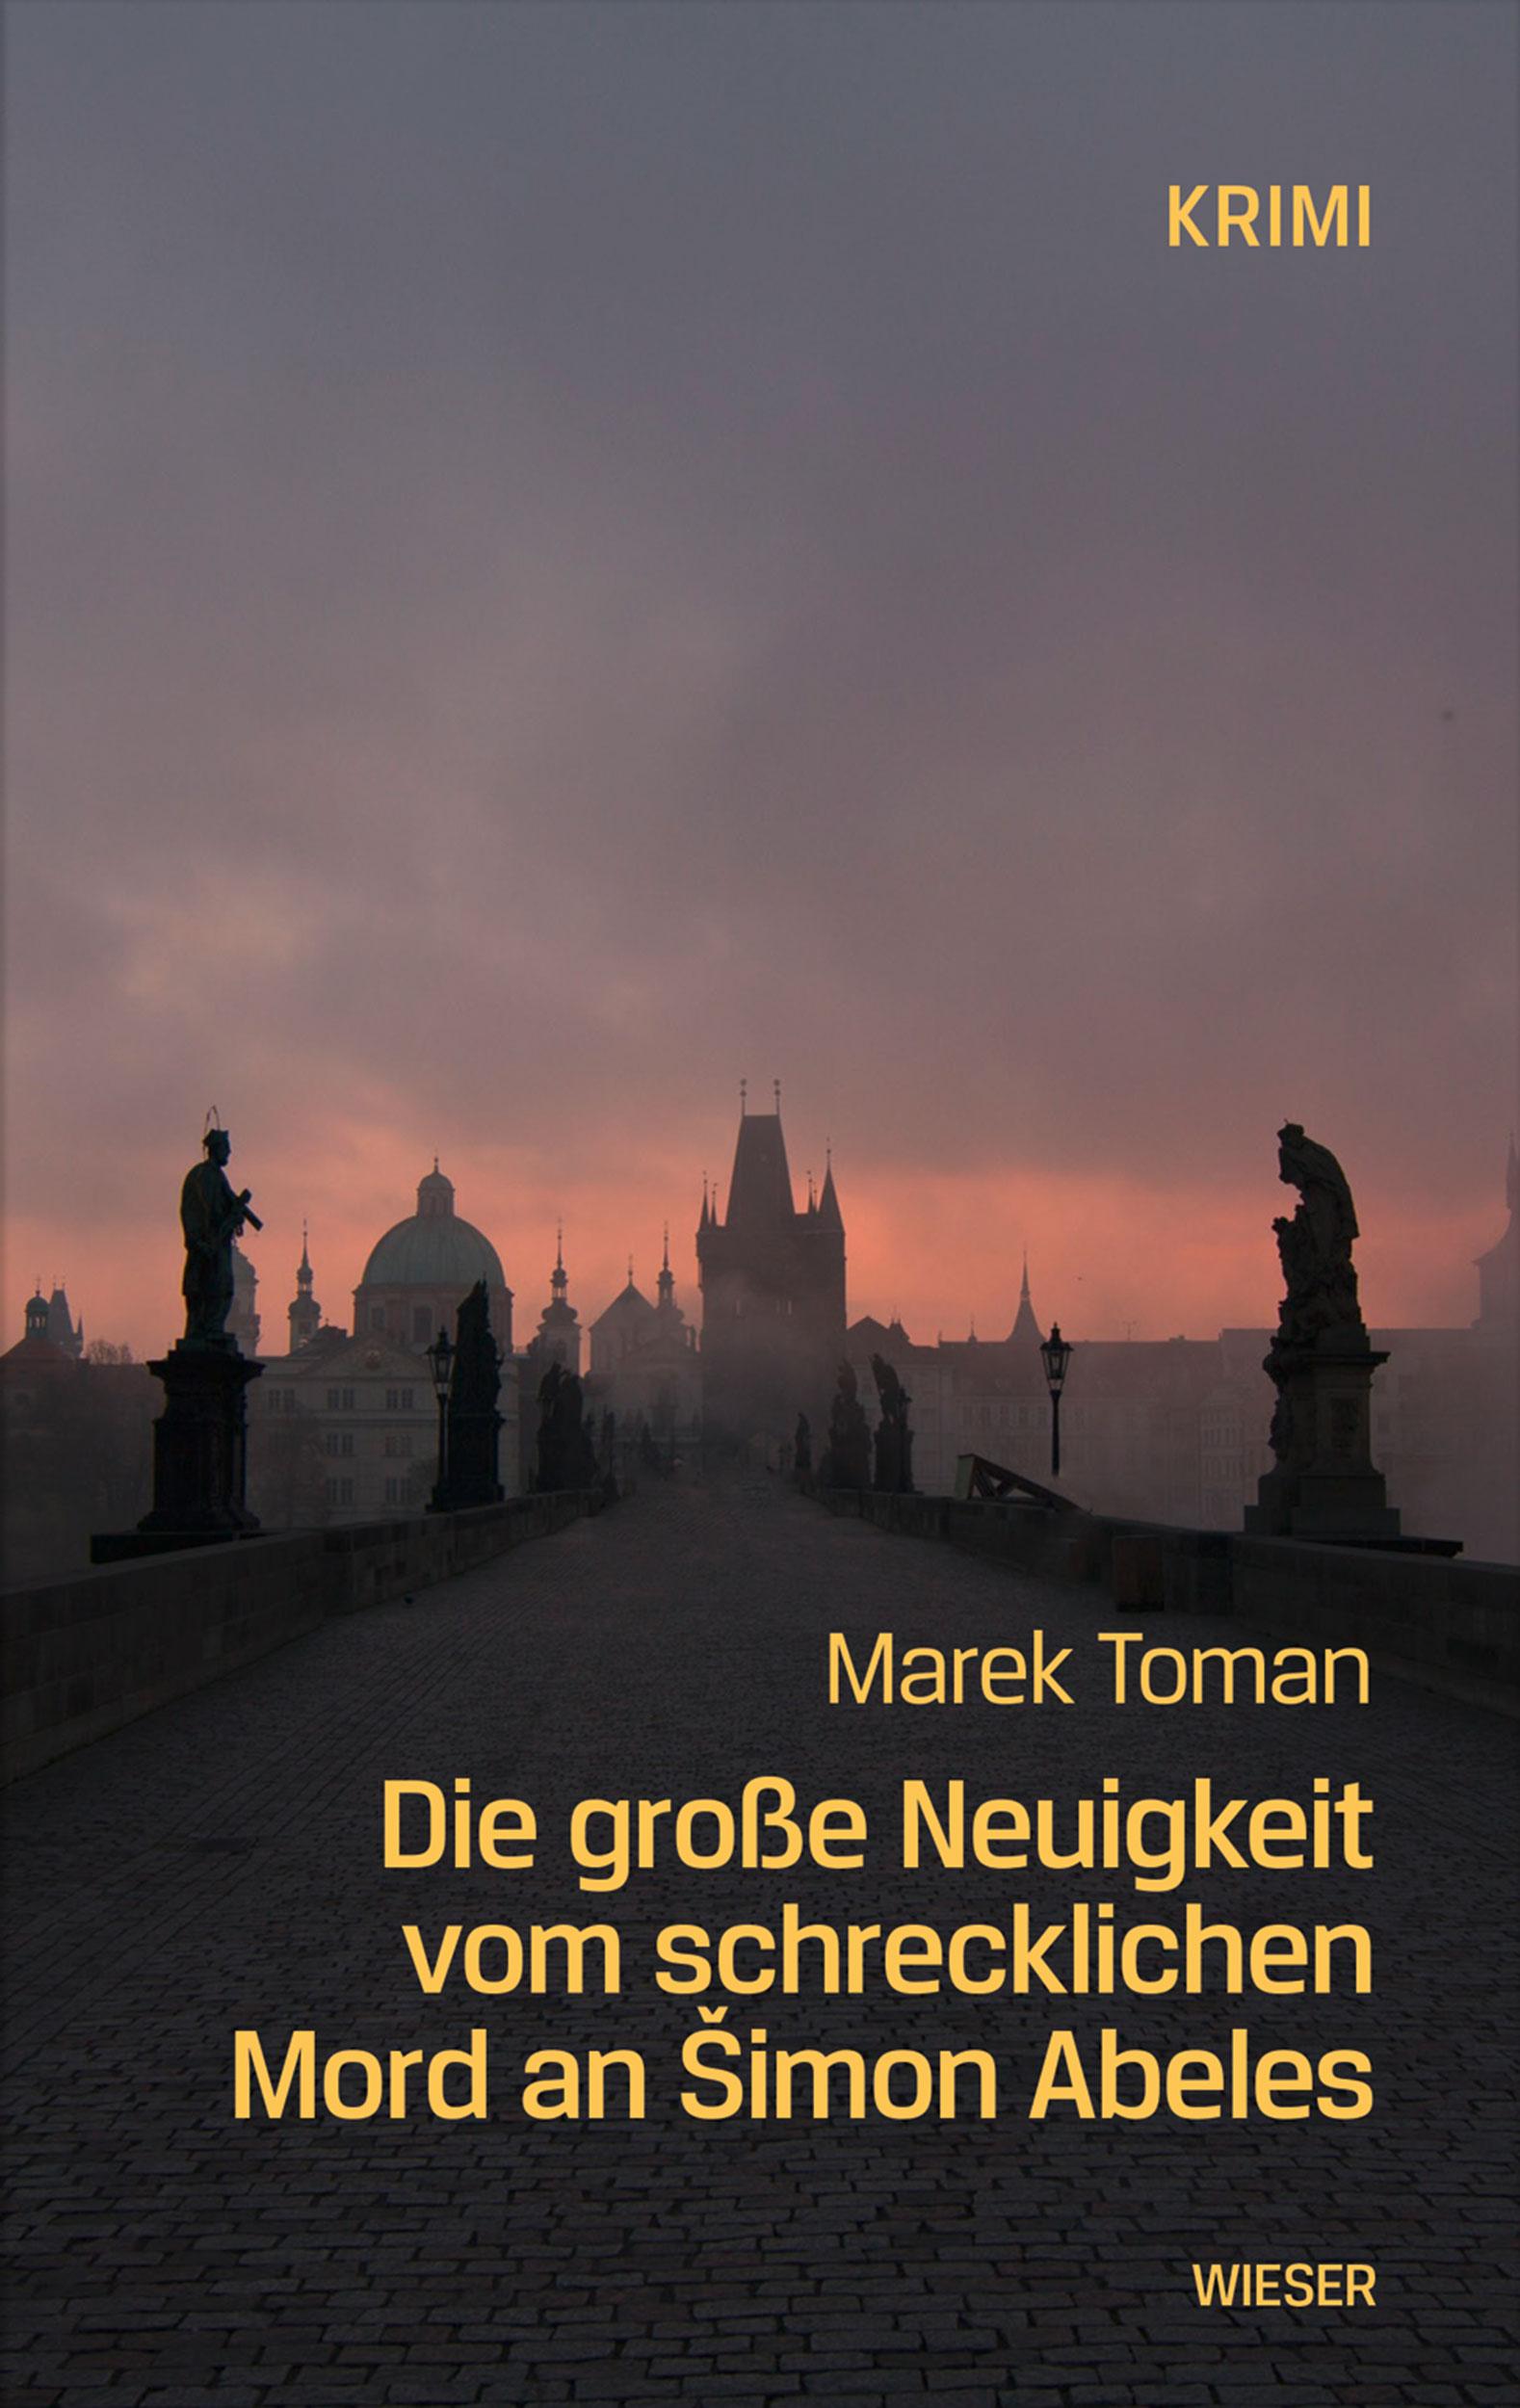 Abeles_german_cover